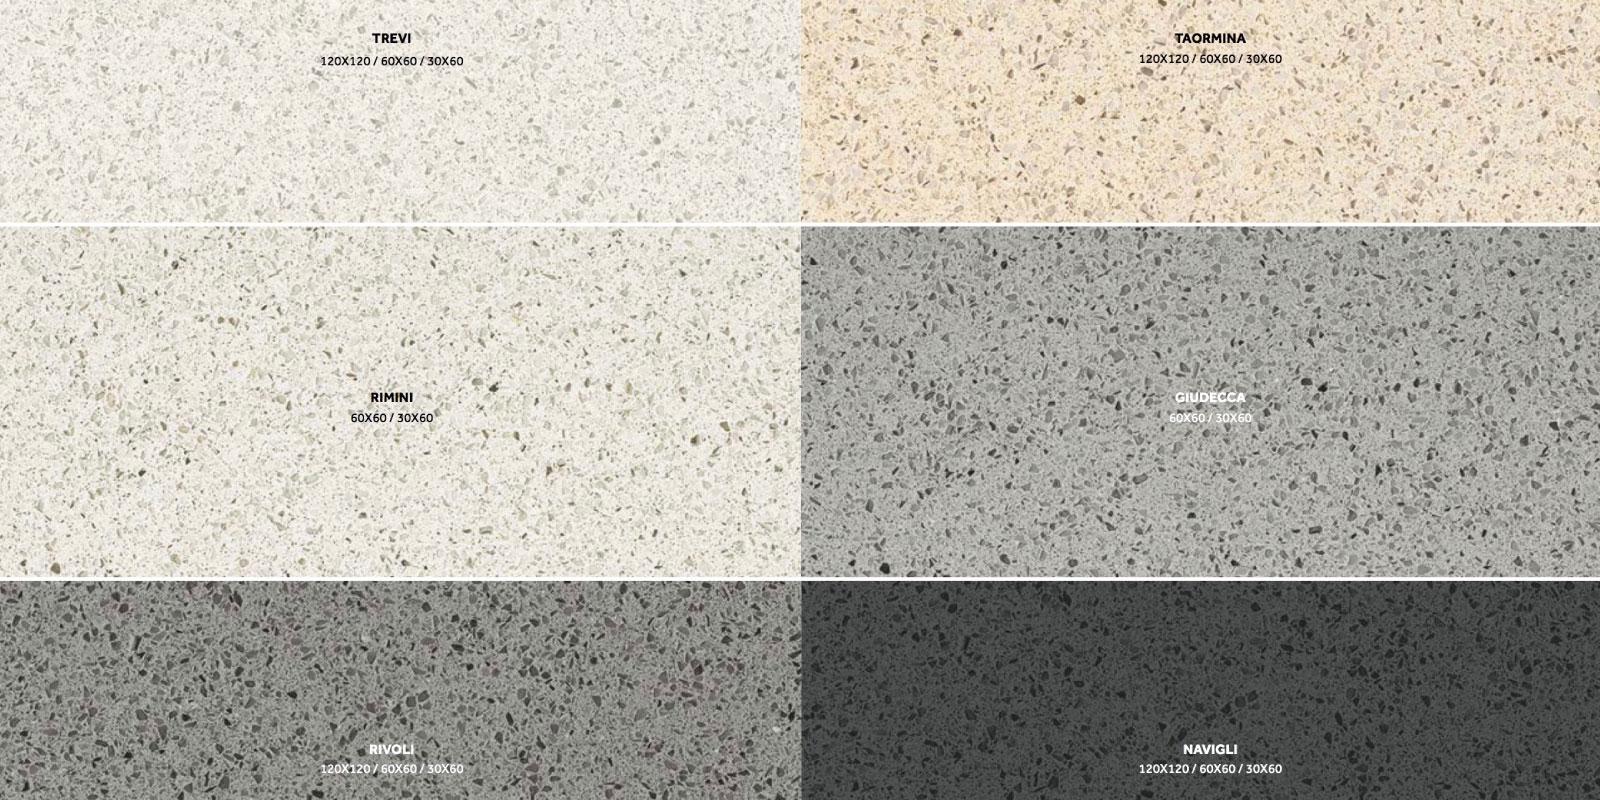 Terrazzo Flooring Alternatives Ceasar Autore From Trinity Surfaces